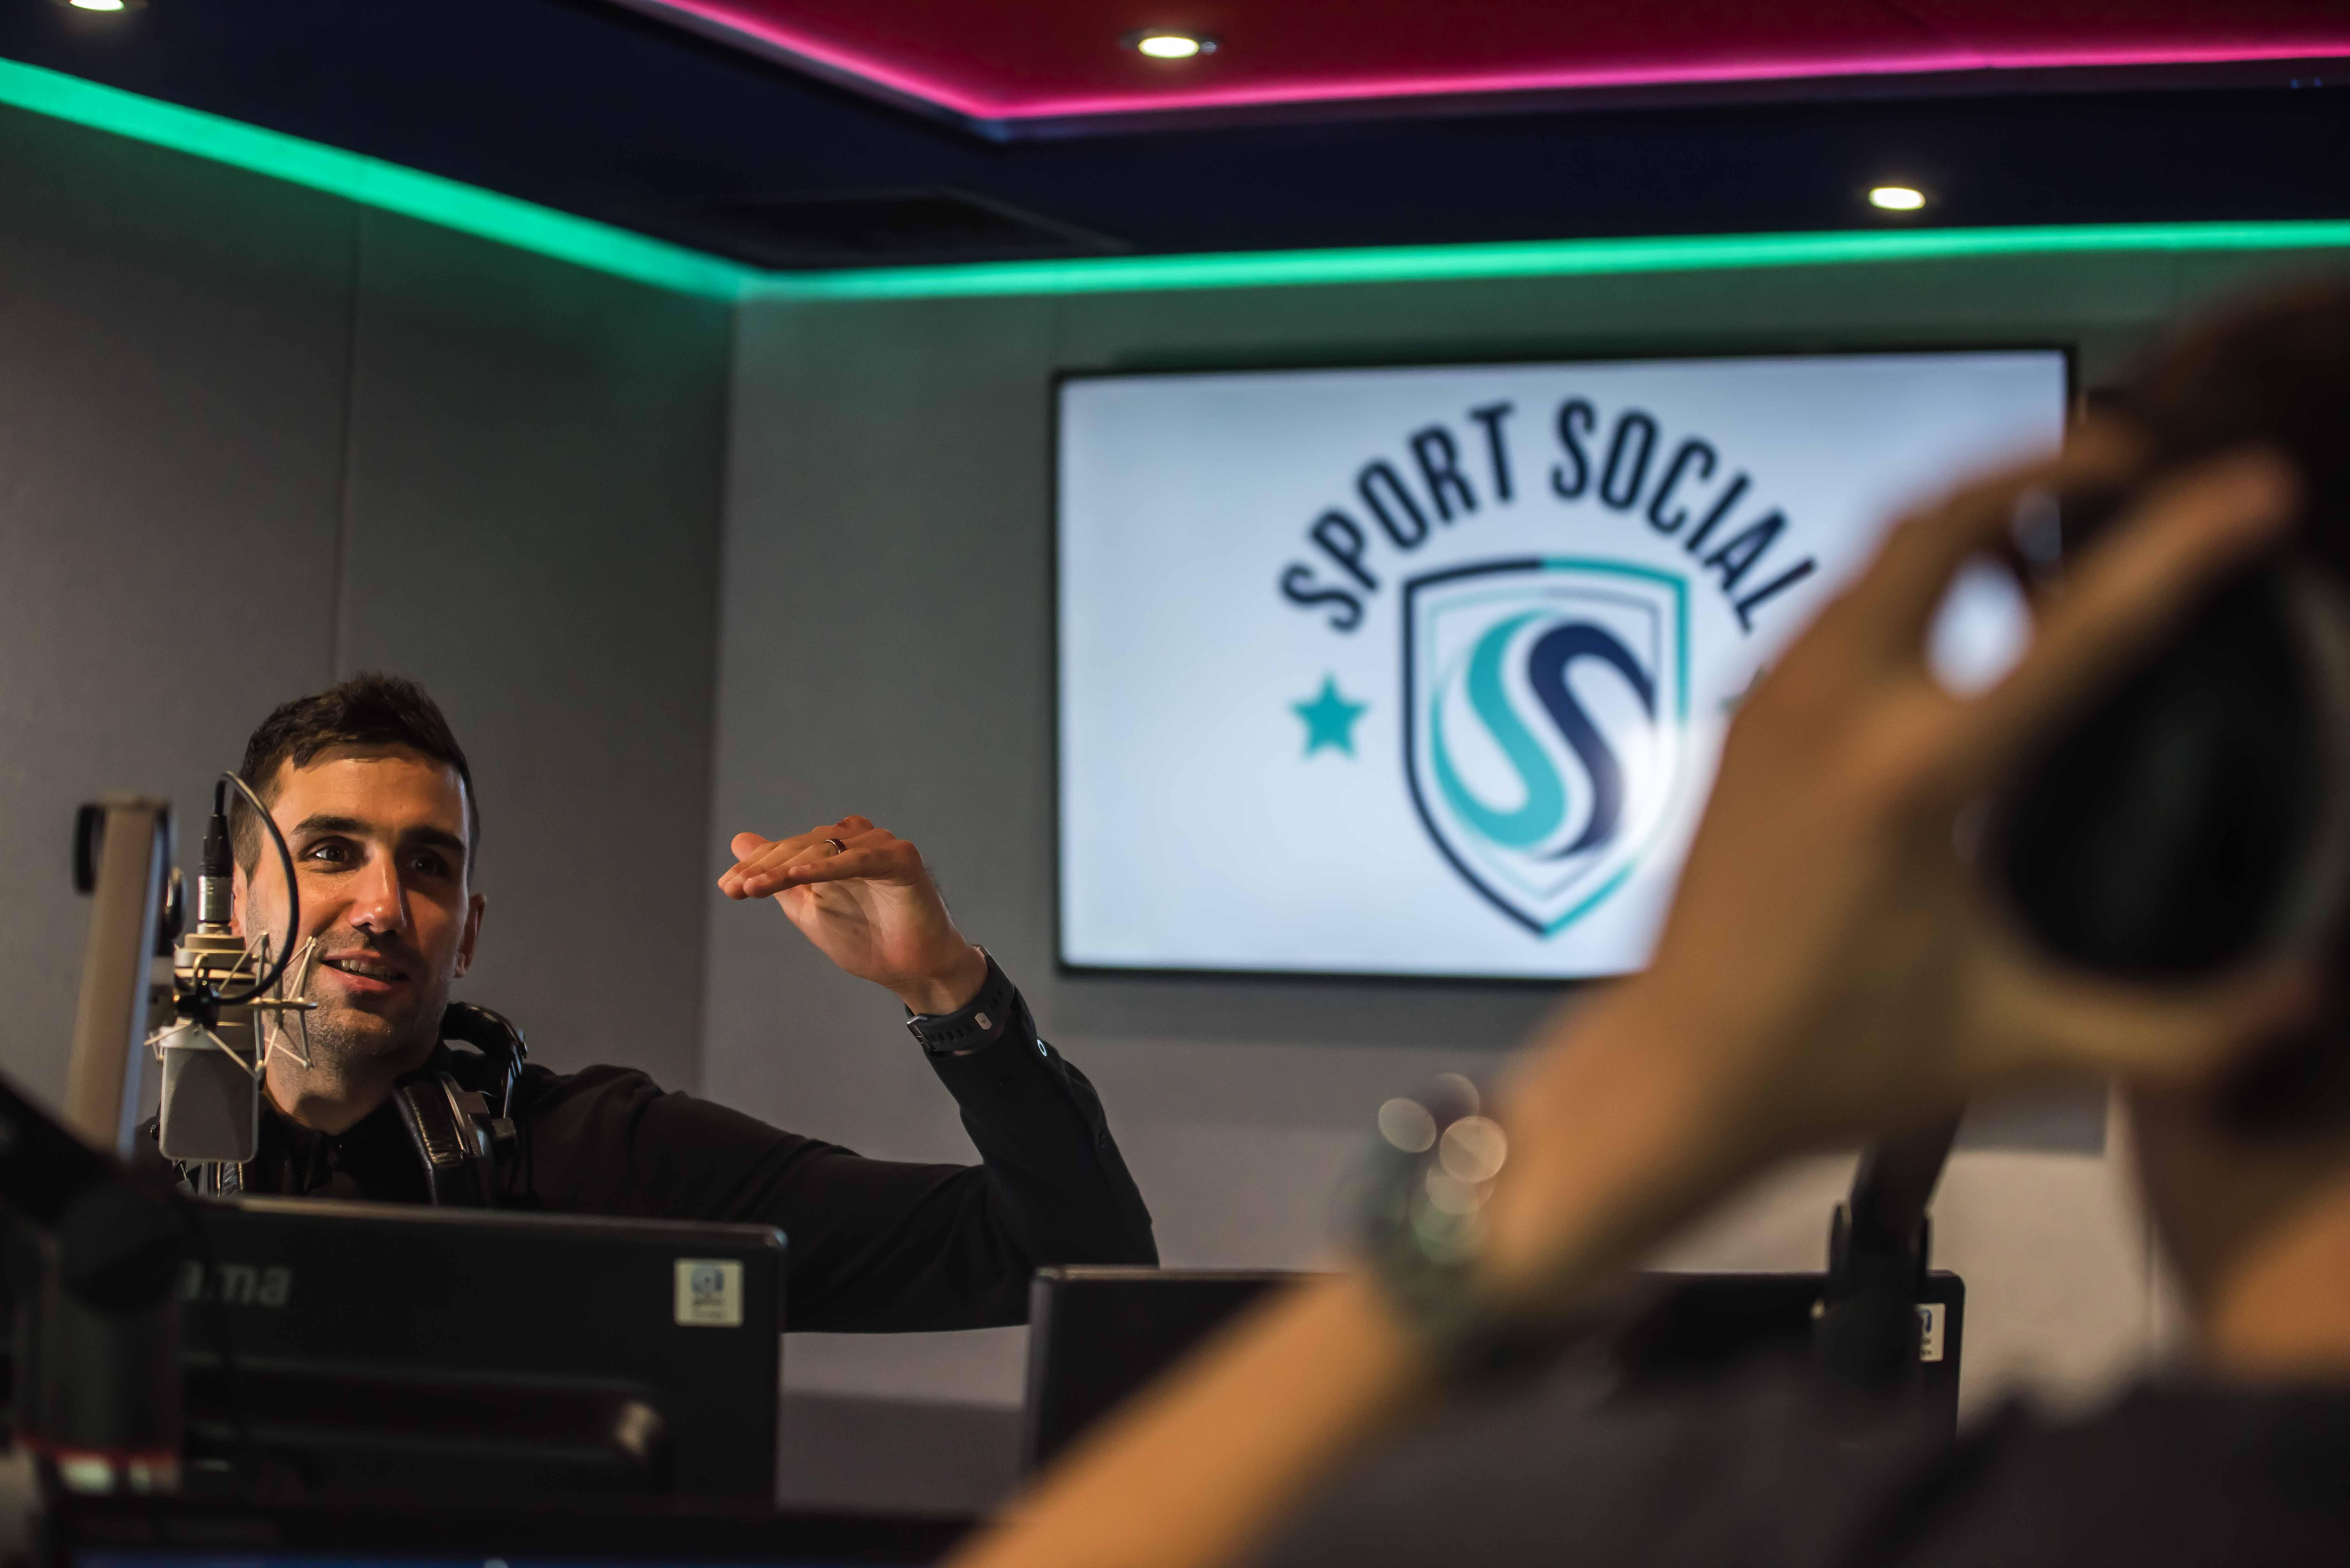 Jim Salveson, Sport Social, Alexa Premier League